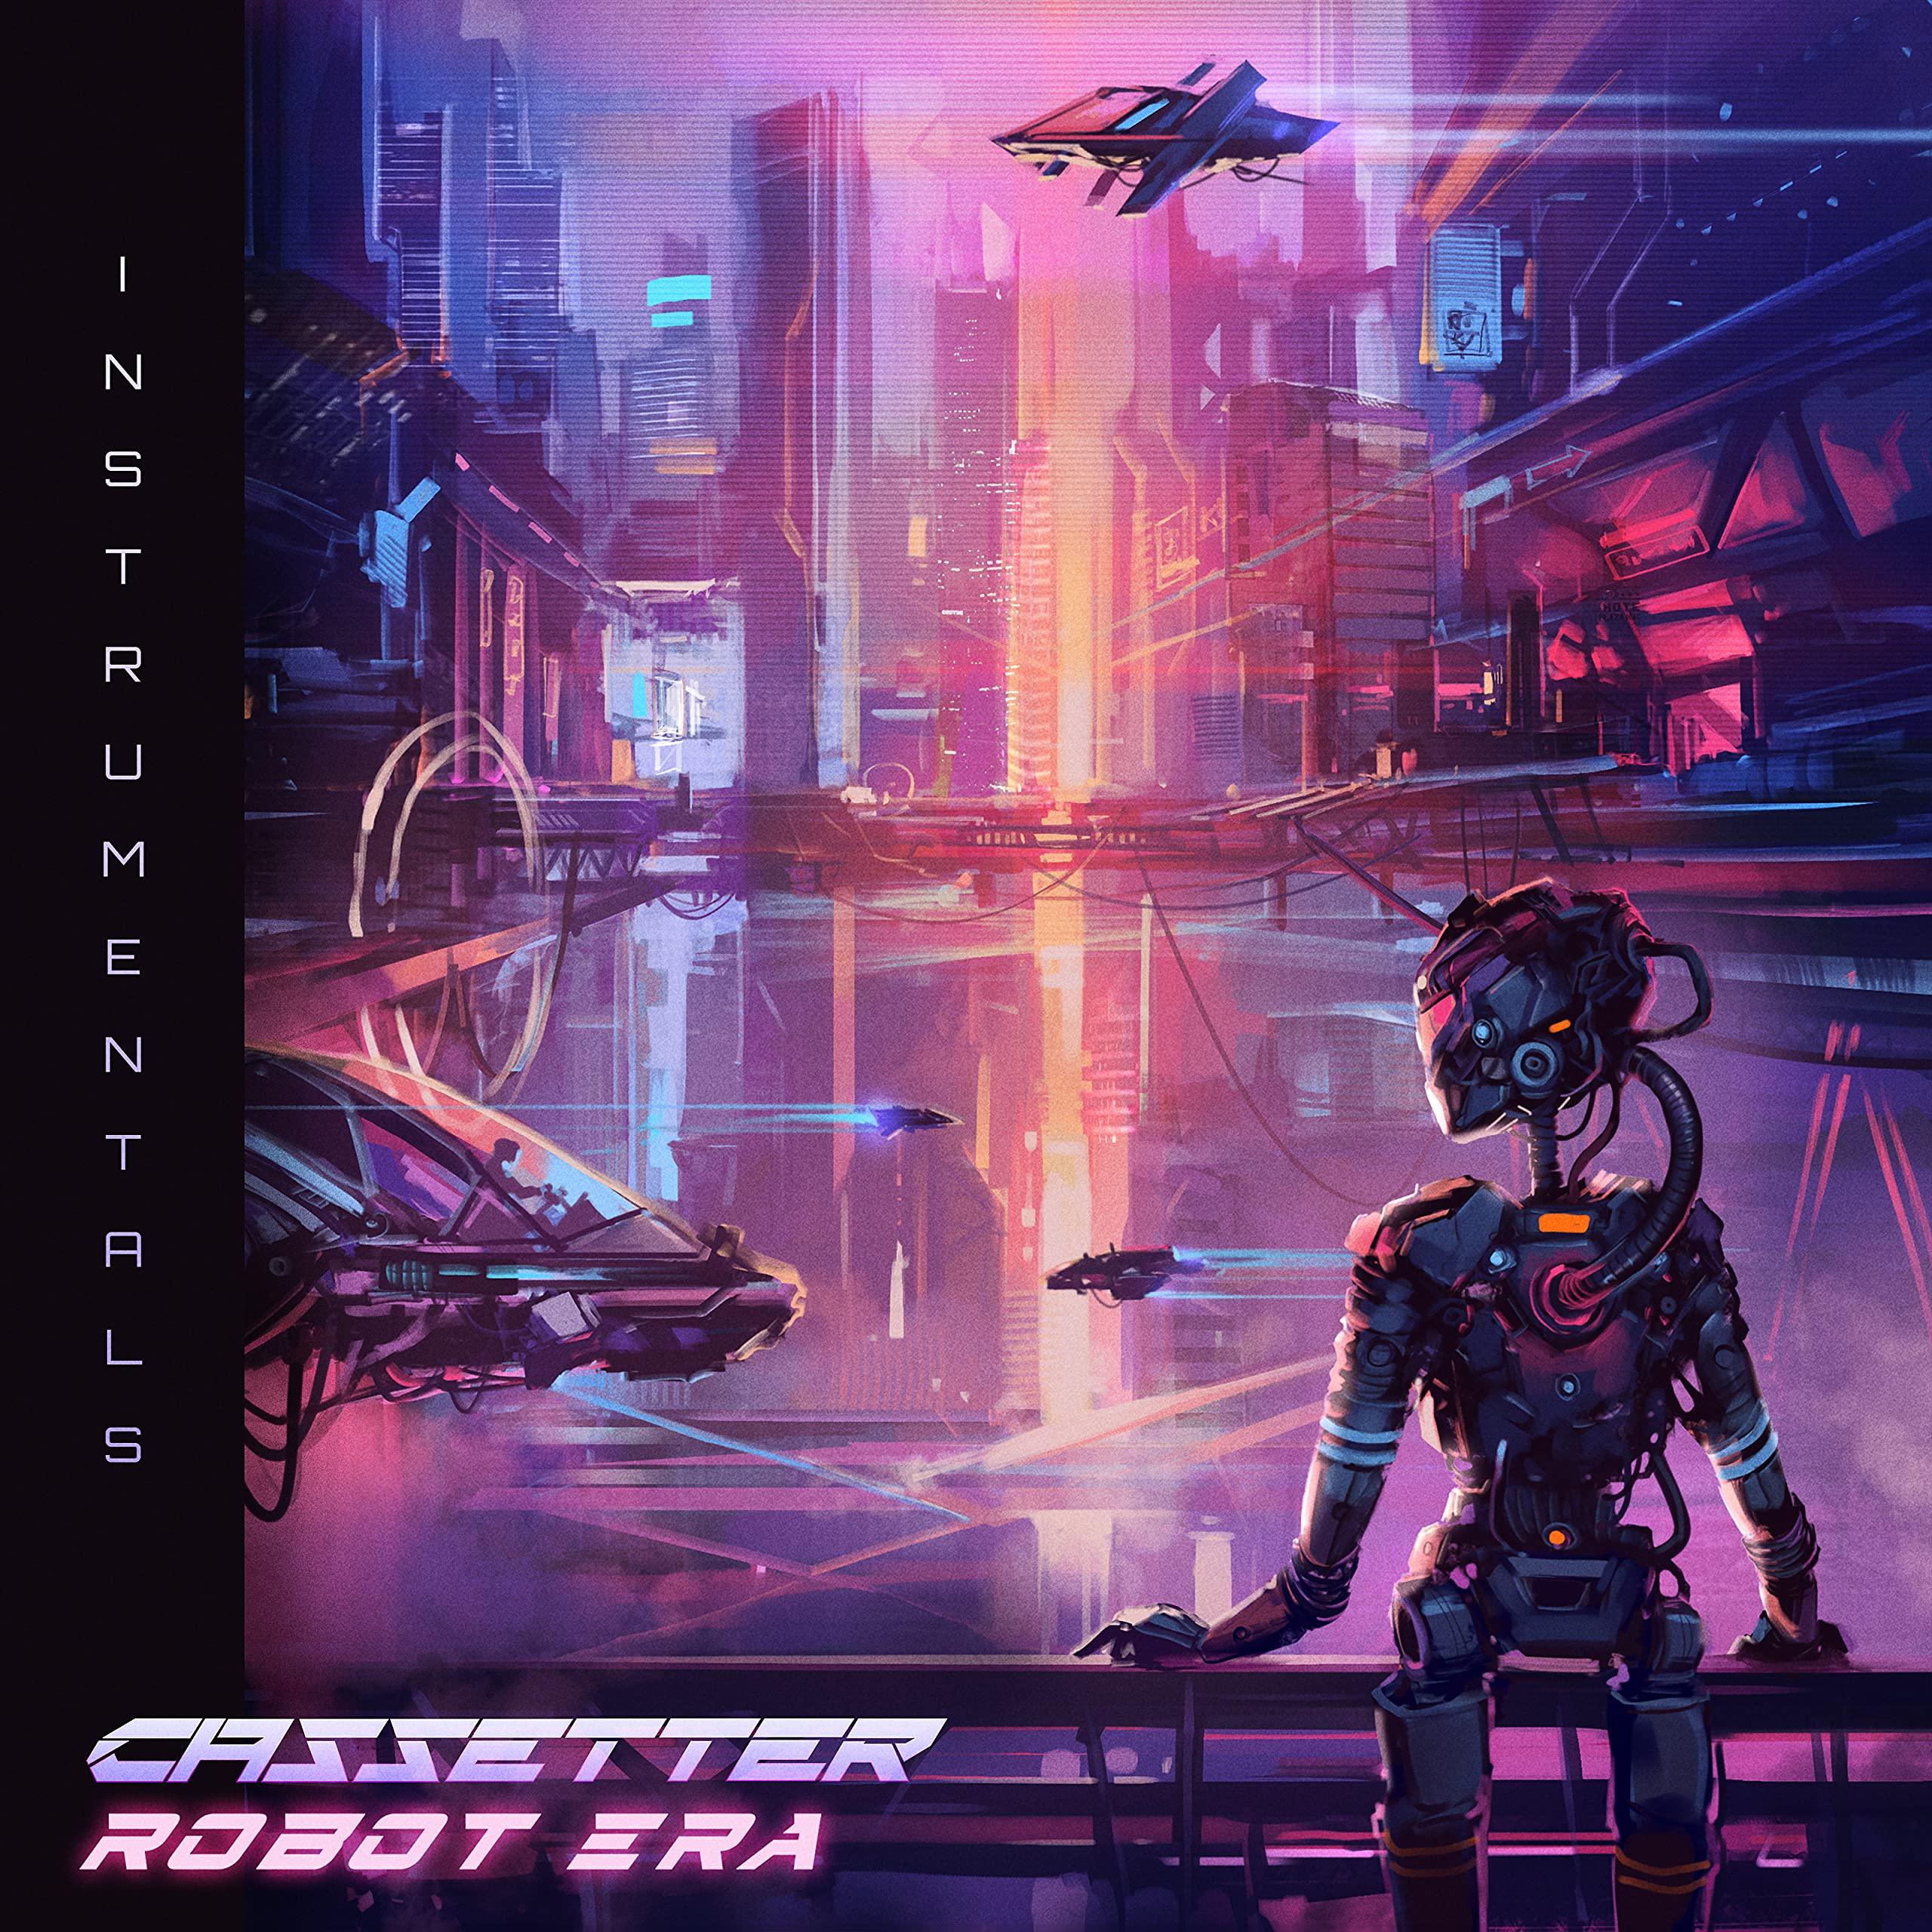 Cassetter - Robot Era (Instrumentals) (2021) [FLAC] Download